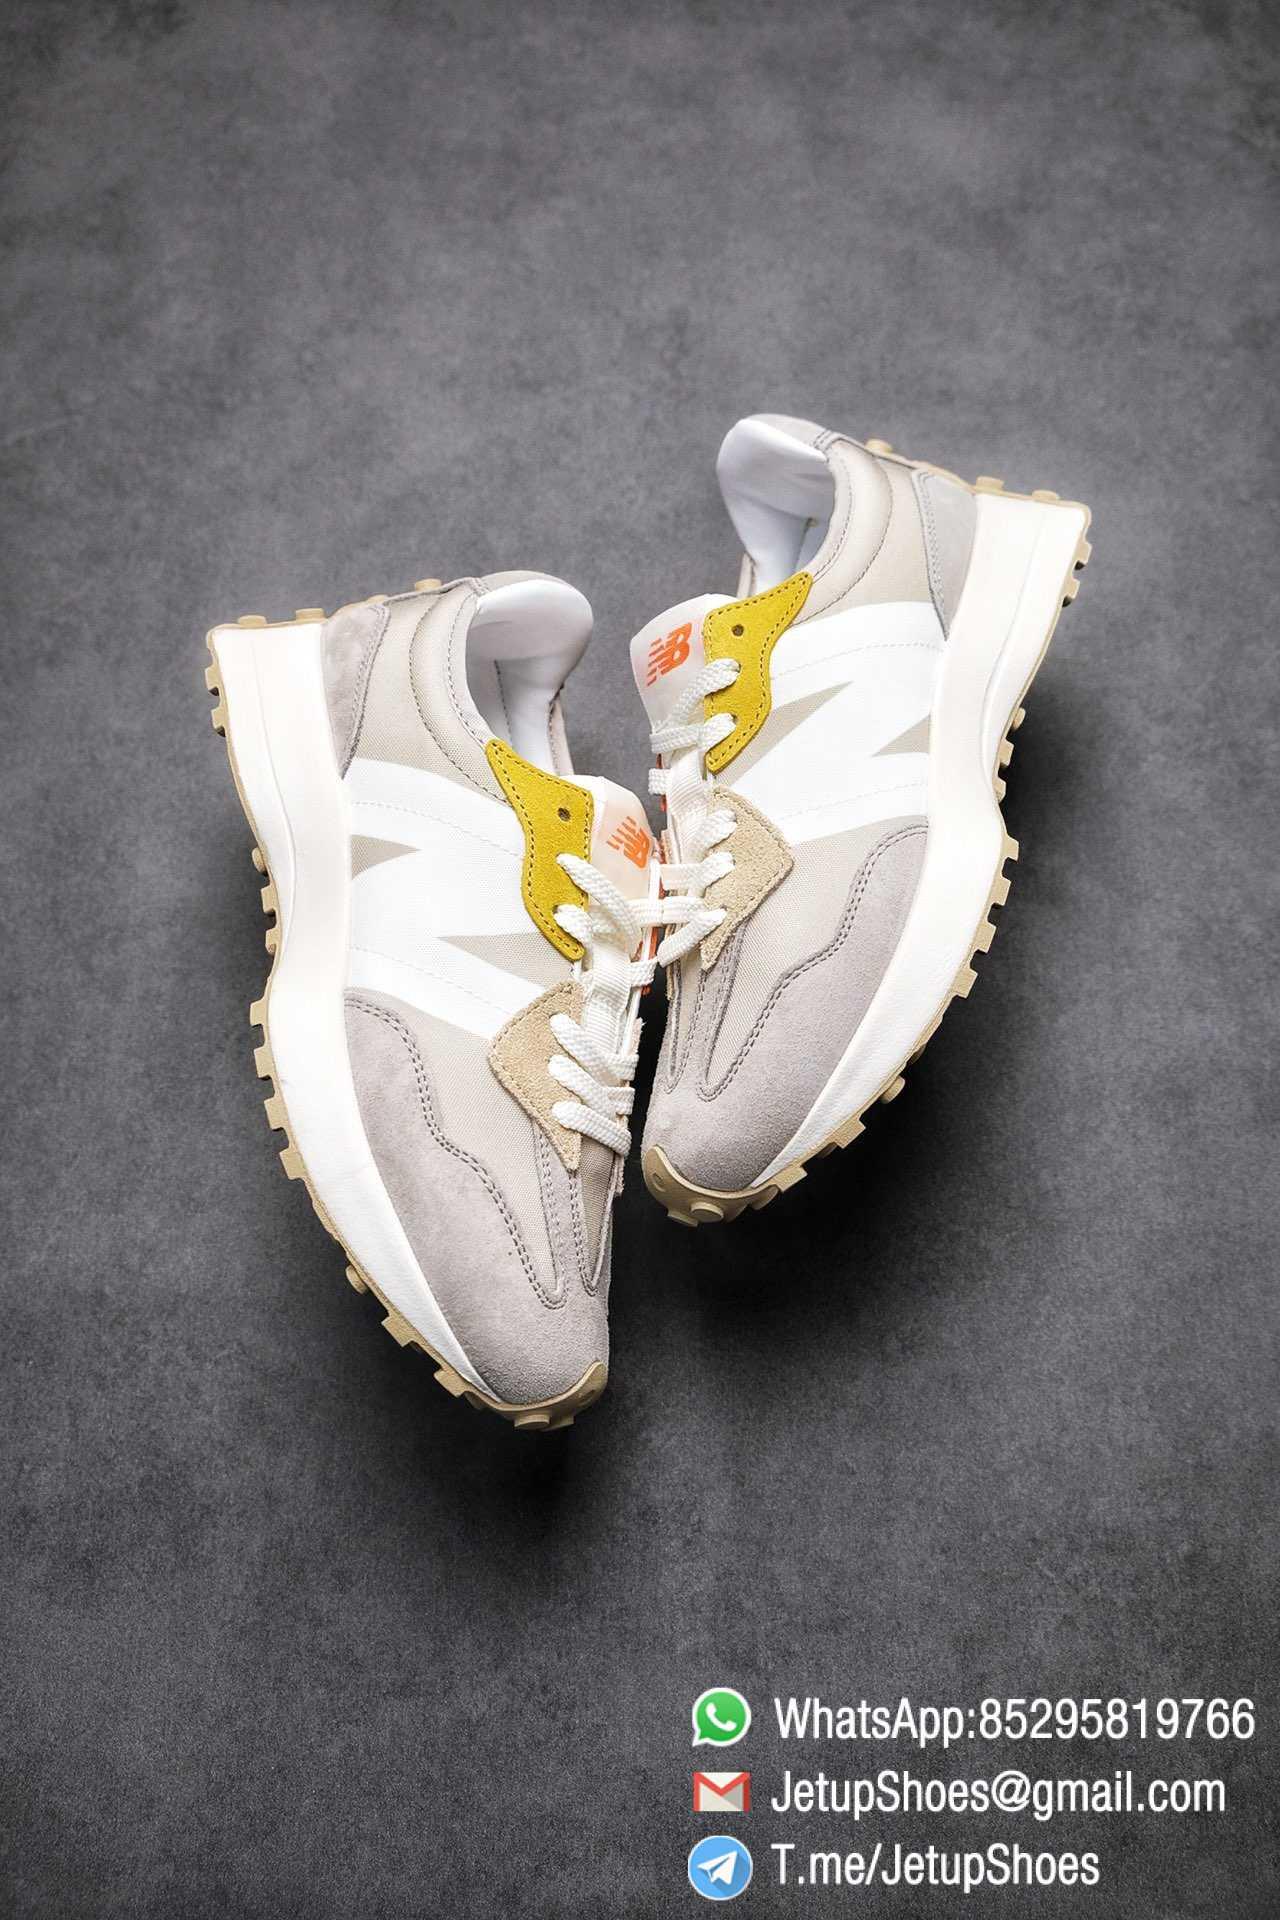 Best Replica New Balance Wmns 327 Light Grey Grey Khaki Upper SKU WS327MS RepSneakers Top Snkrs 03